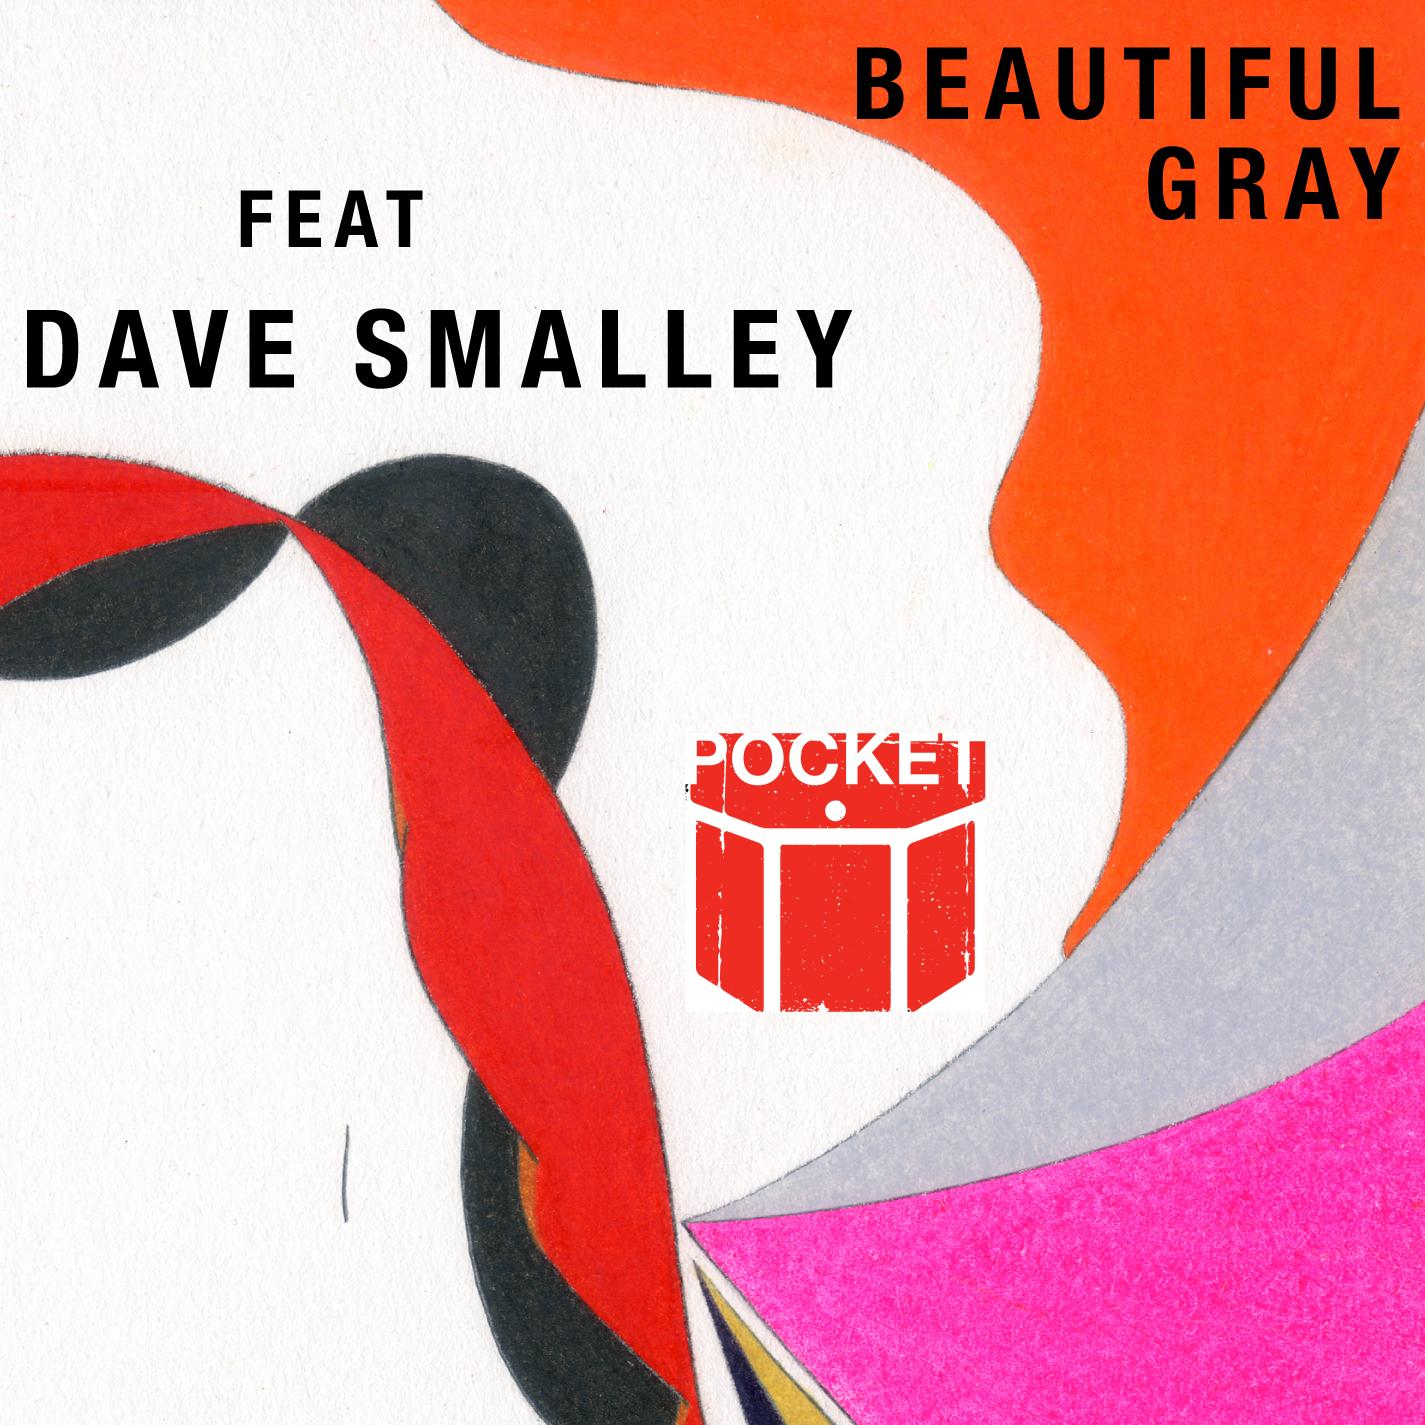 Pocket - Beautiful Gray (CD Single)